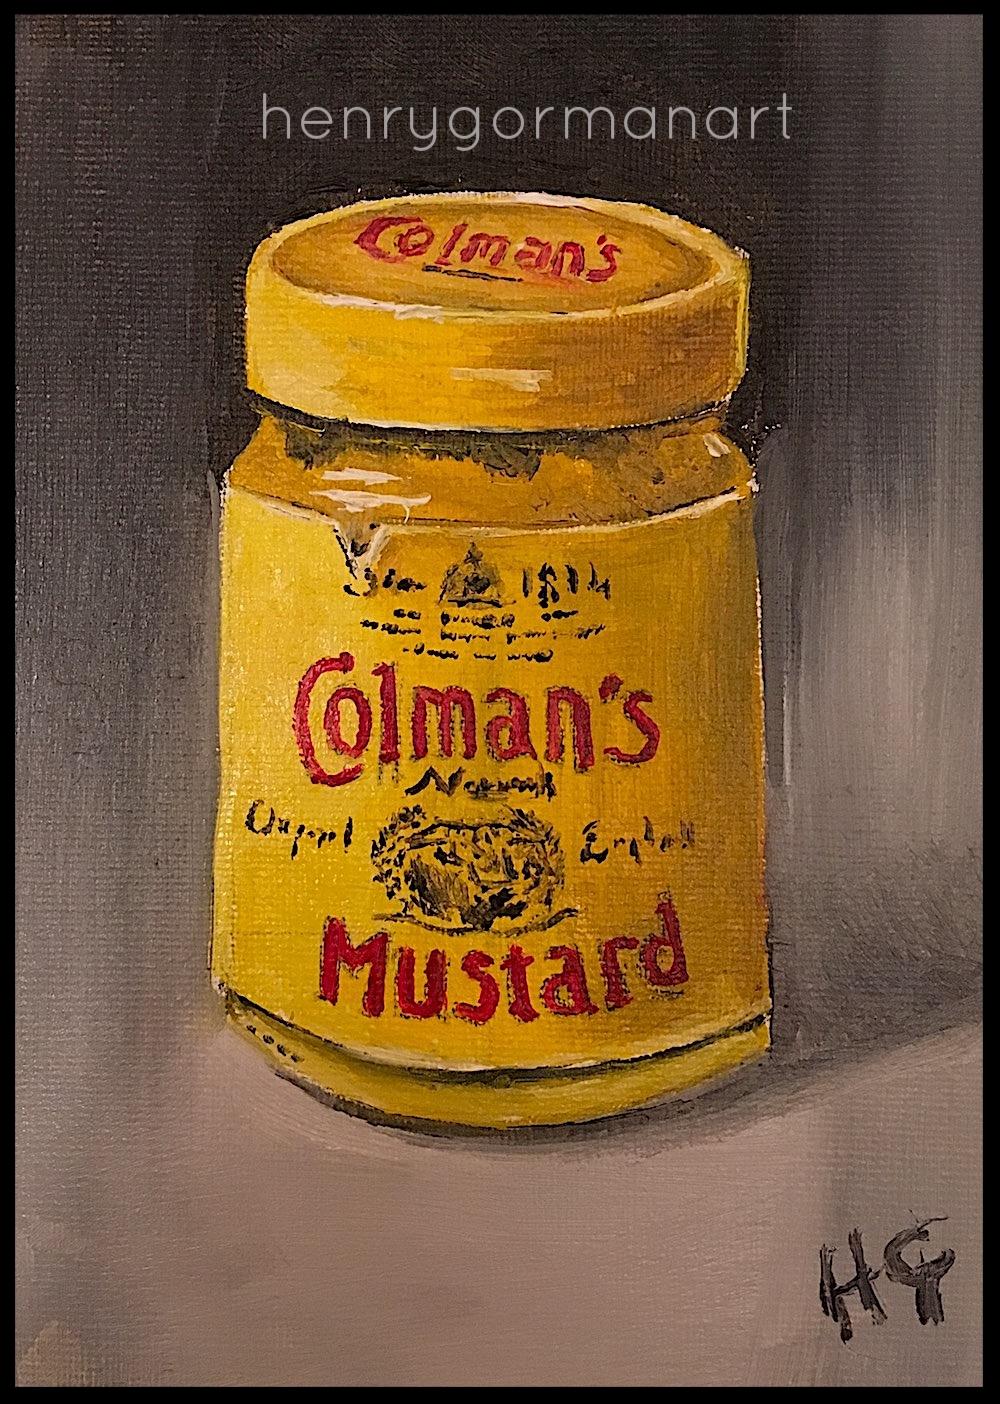 'Cutting the Mustard'